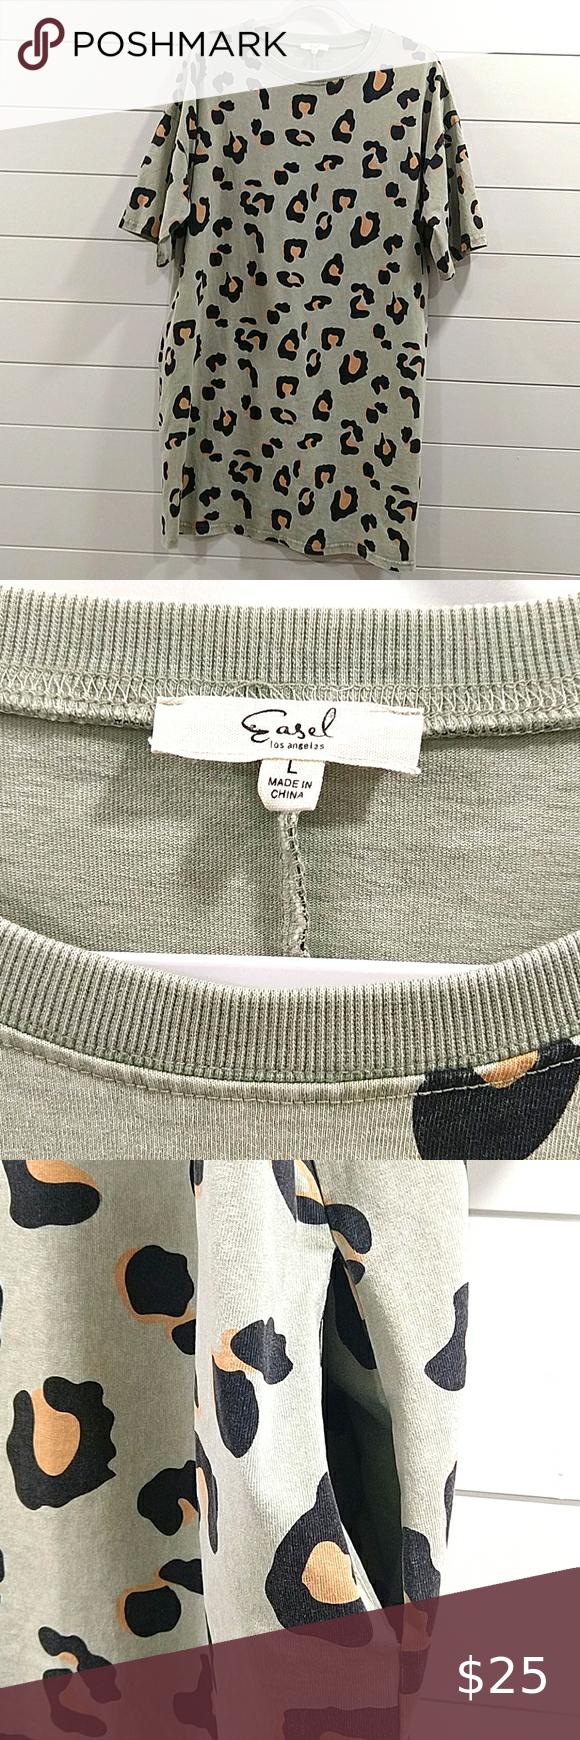 Easel Dress w/pockets